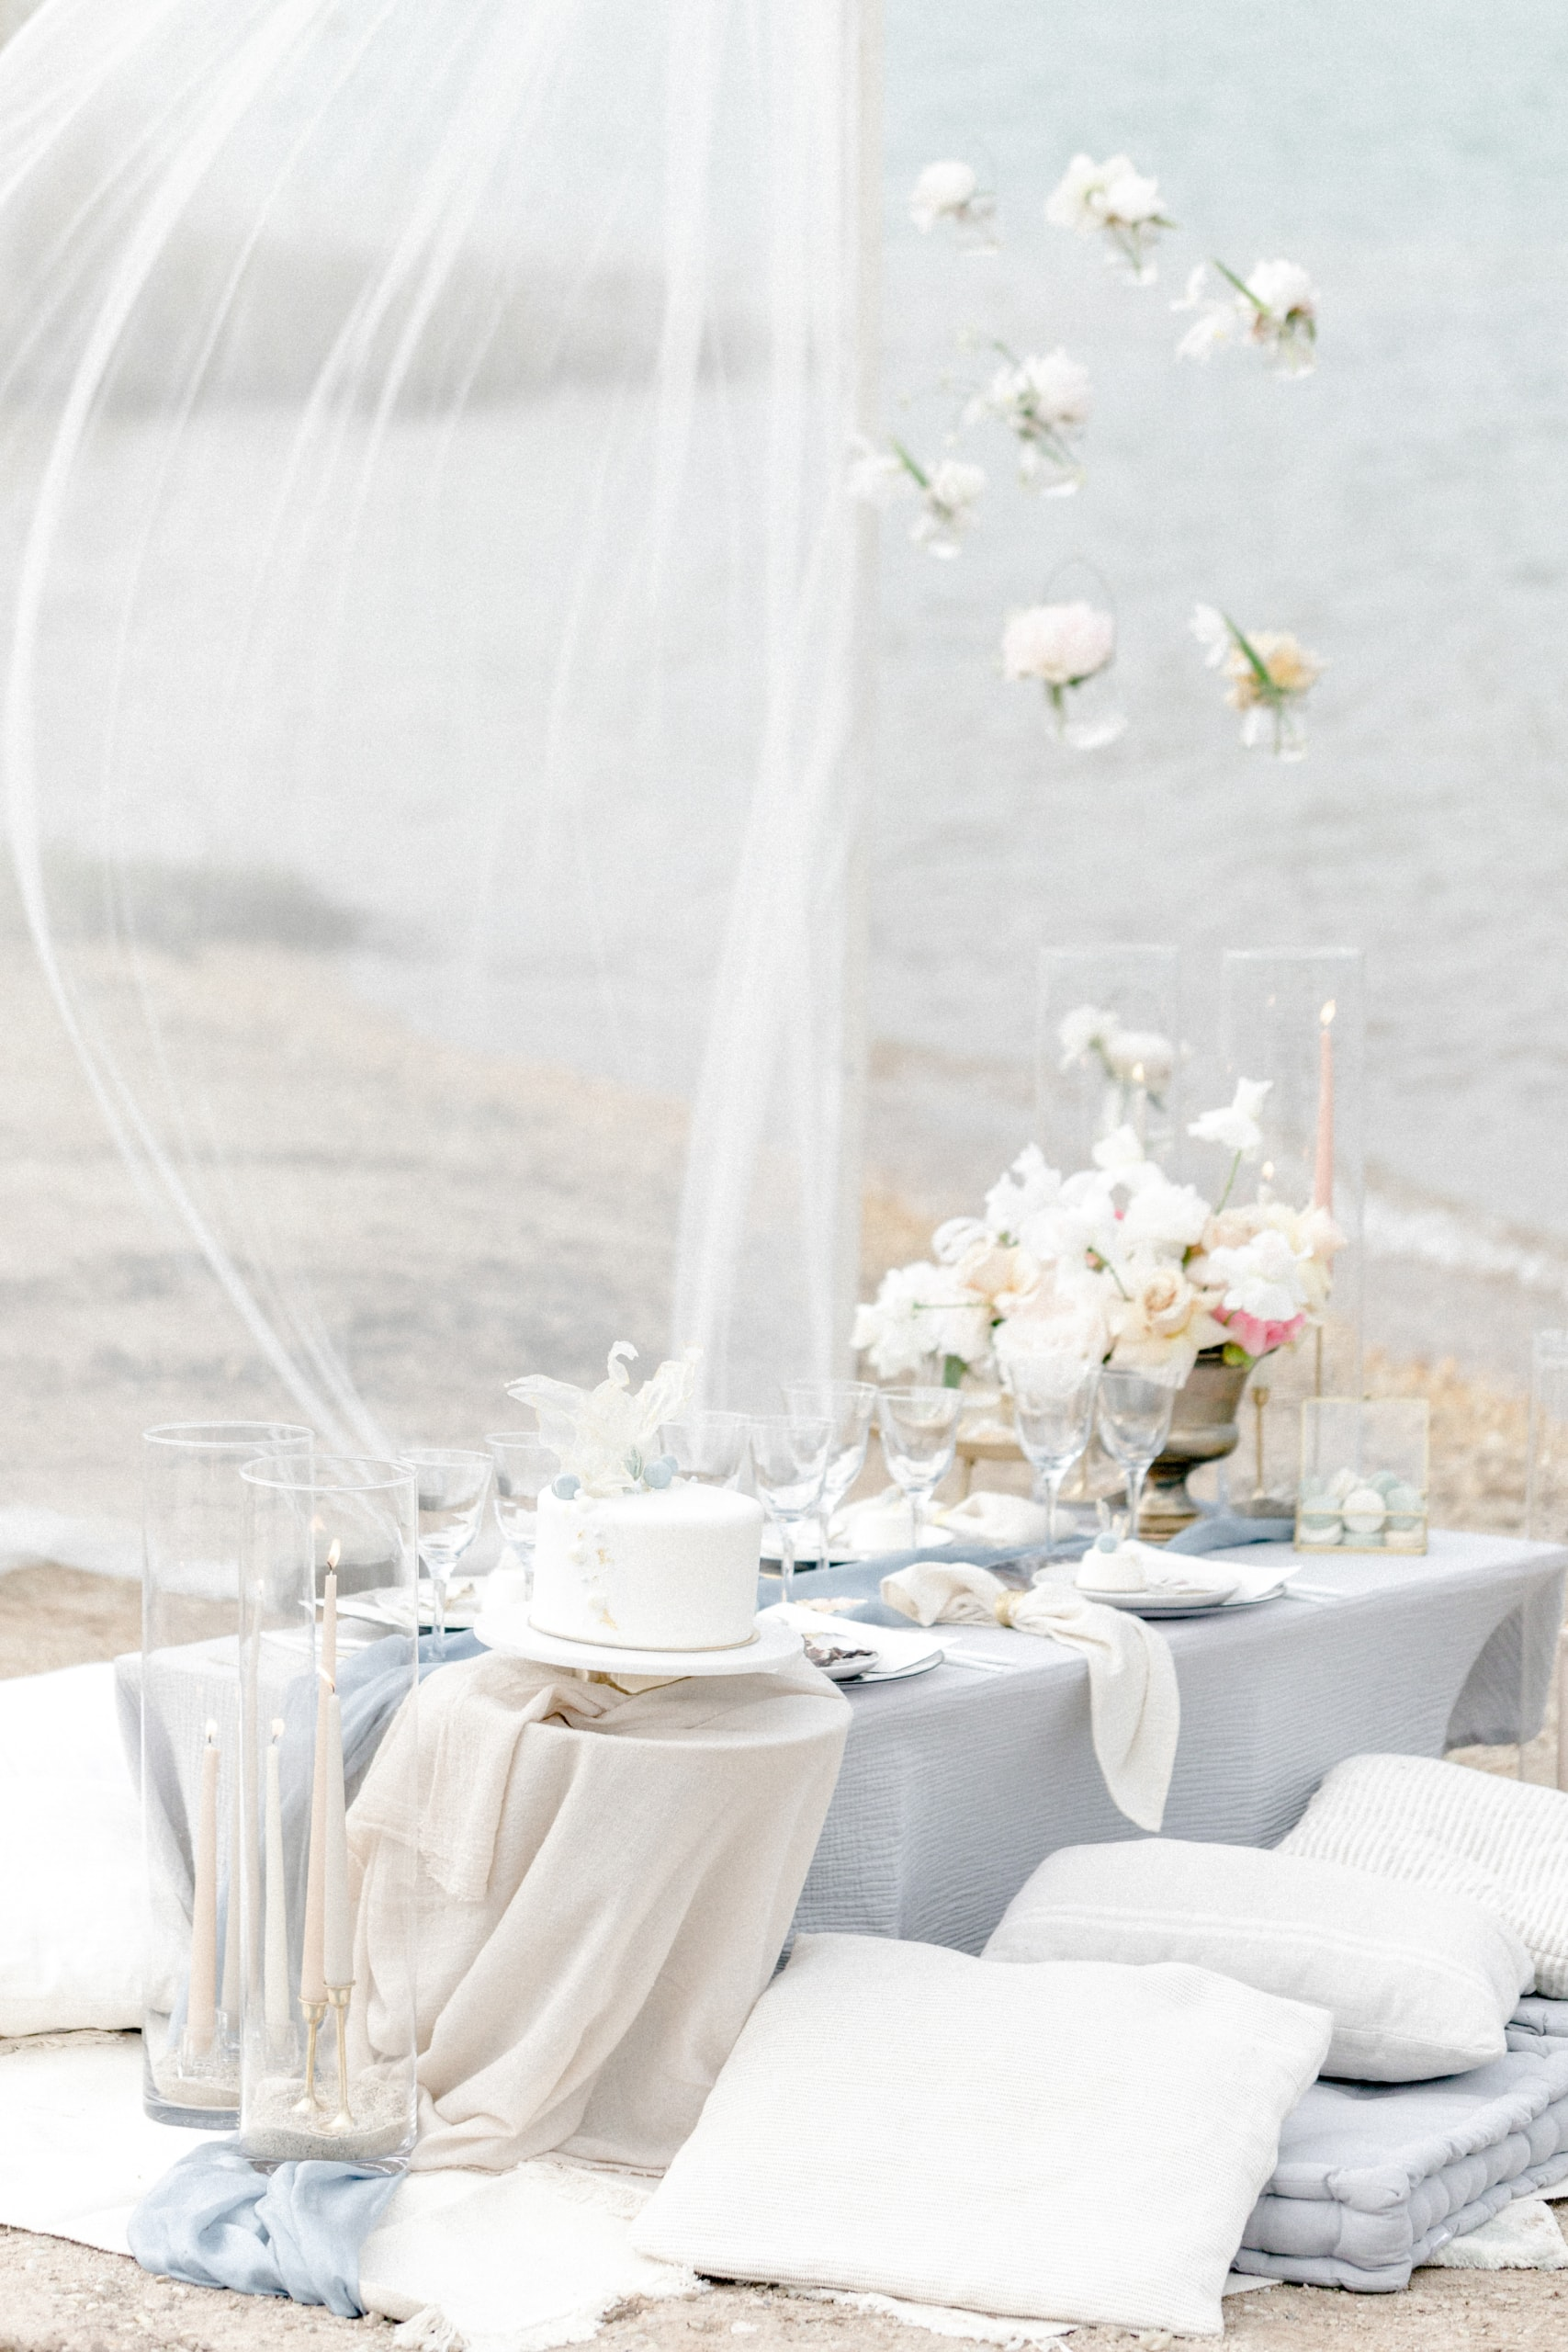 See Hochzeit Fine Art Table Setting